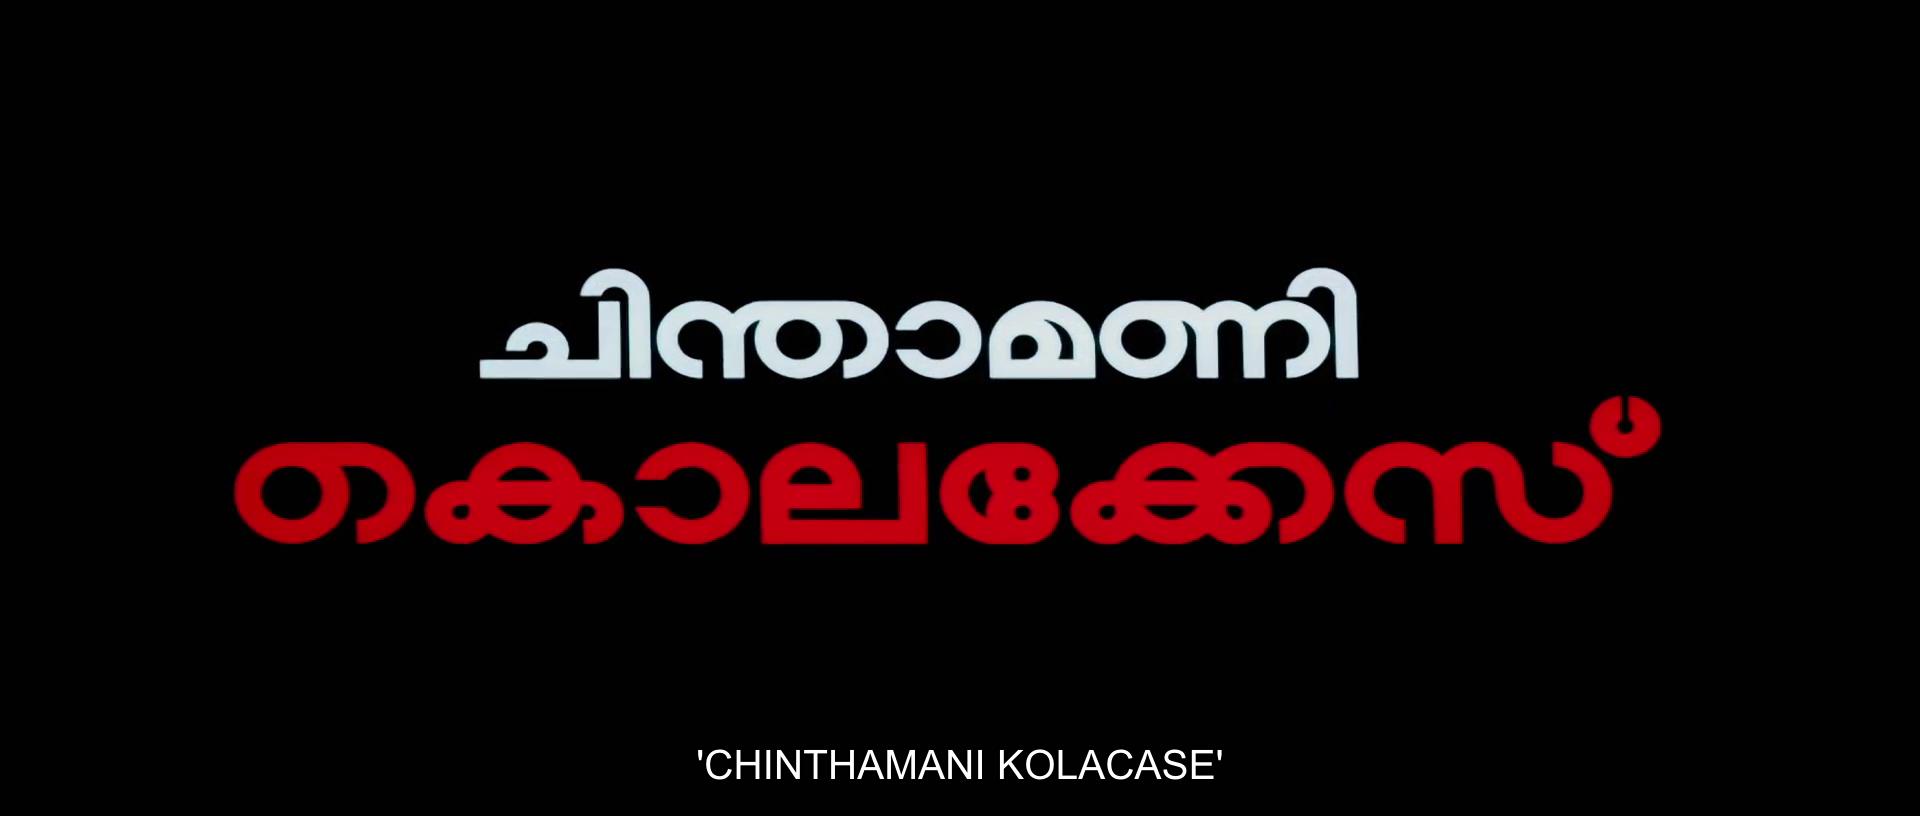 Chinthamani Kolacase (2006)